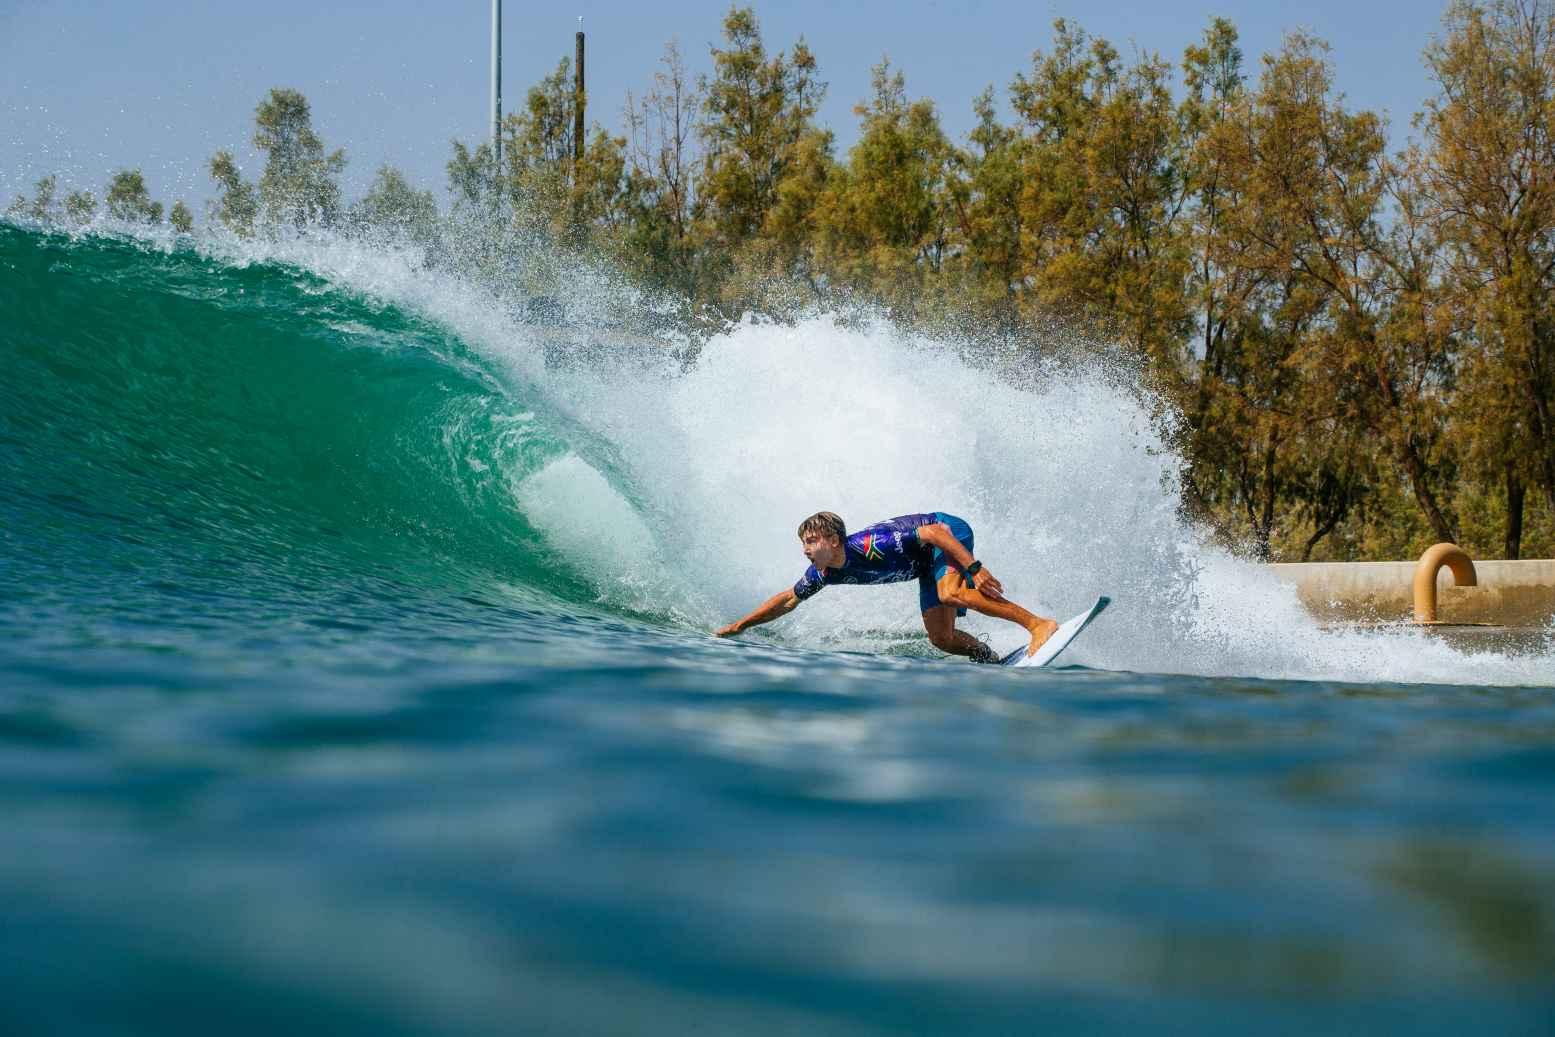 surf30 surf ranch pro 2021 wsl surf McGillivray M Morris21Ranch 6851